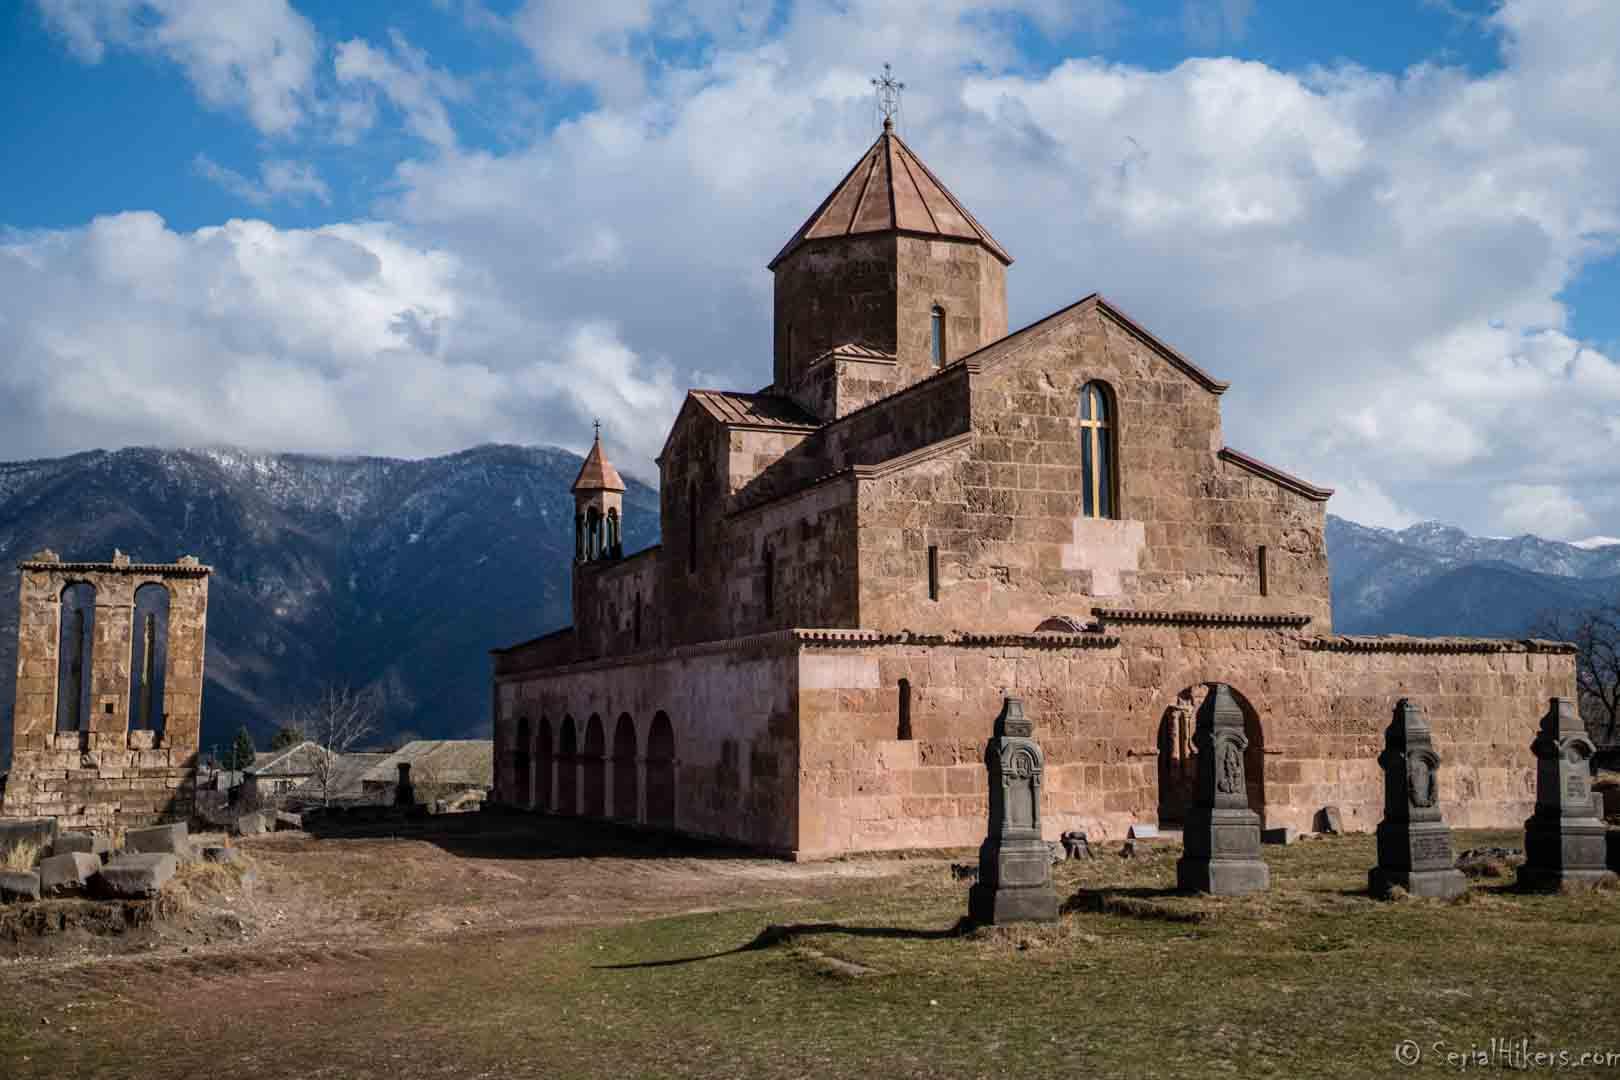 backpacking Jul&Gaux SerialHikers autostop hitchhiking aventure adventure alternative travel voyage volontariat volonteering caucase caucasian armenia armenie Odzun monastery monastère